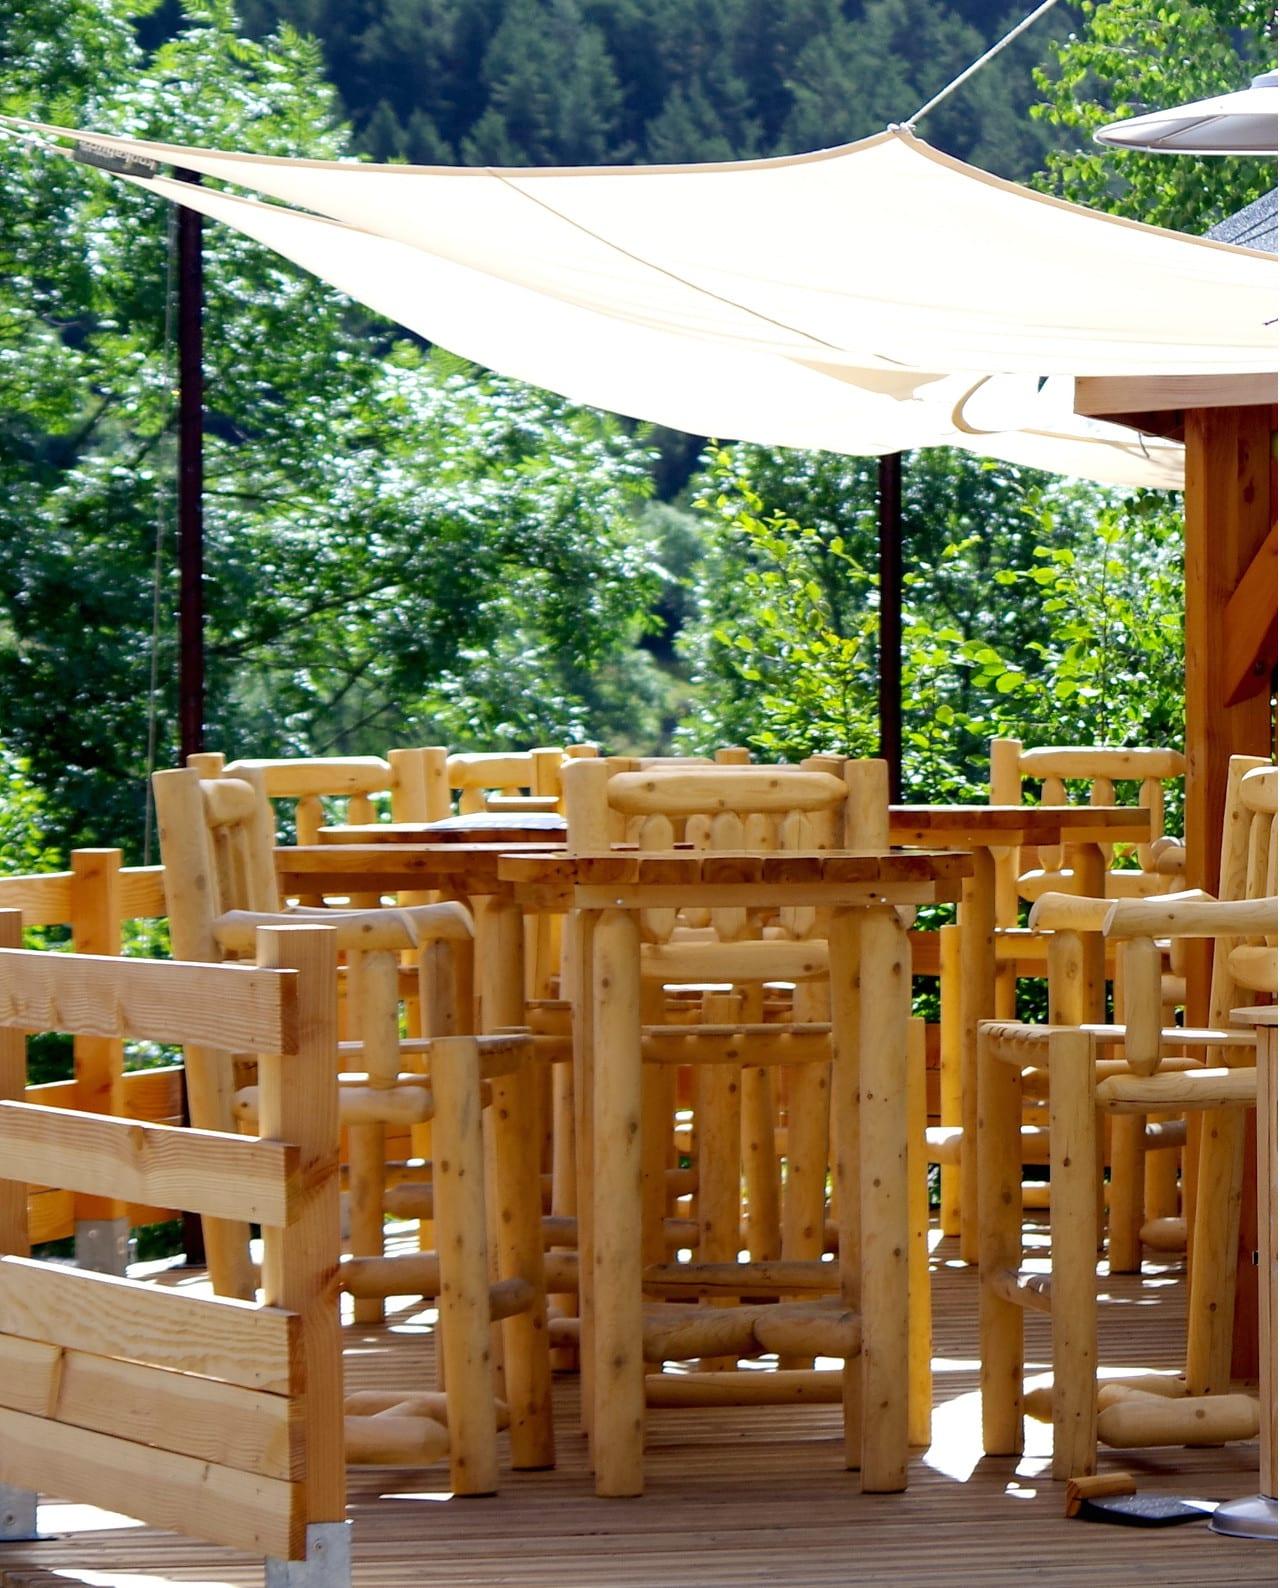 Grande Table Mange Debout : Mange debout en bois grand modèle cèdre rondins